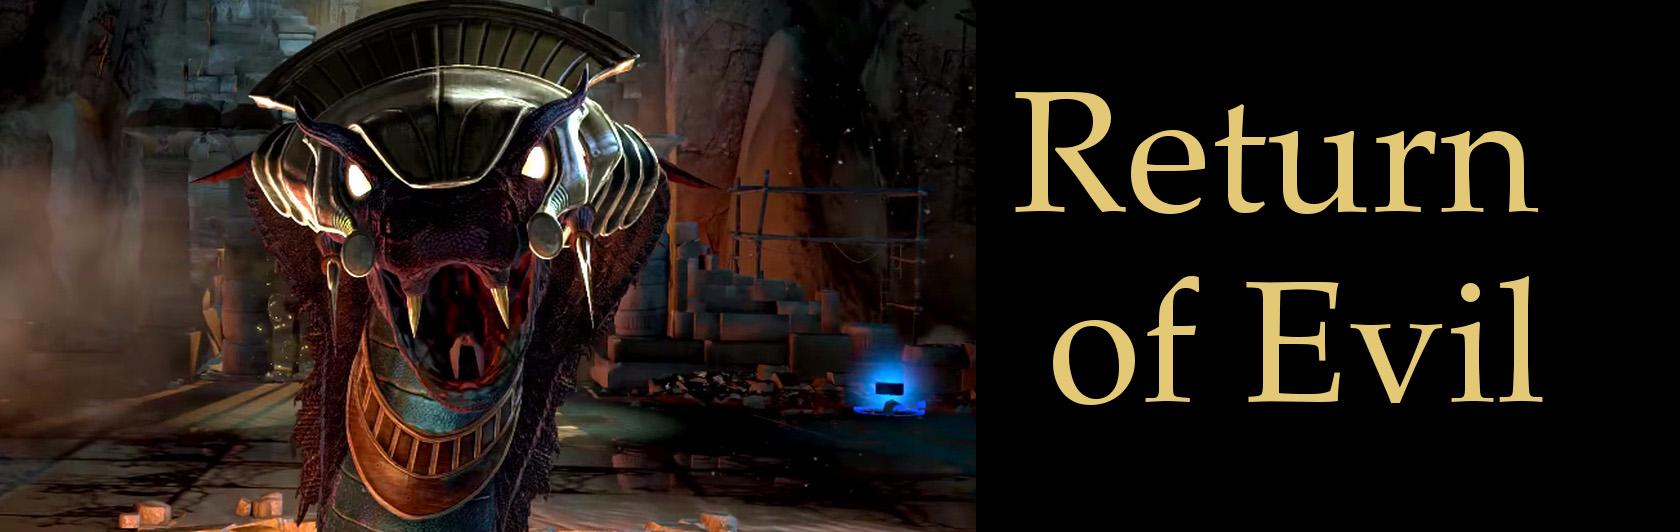 Rippers_Return_of_Evil.jpg